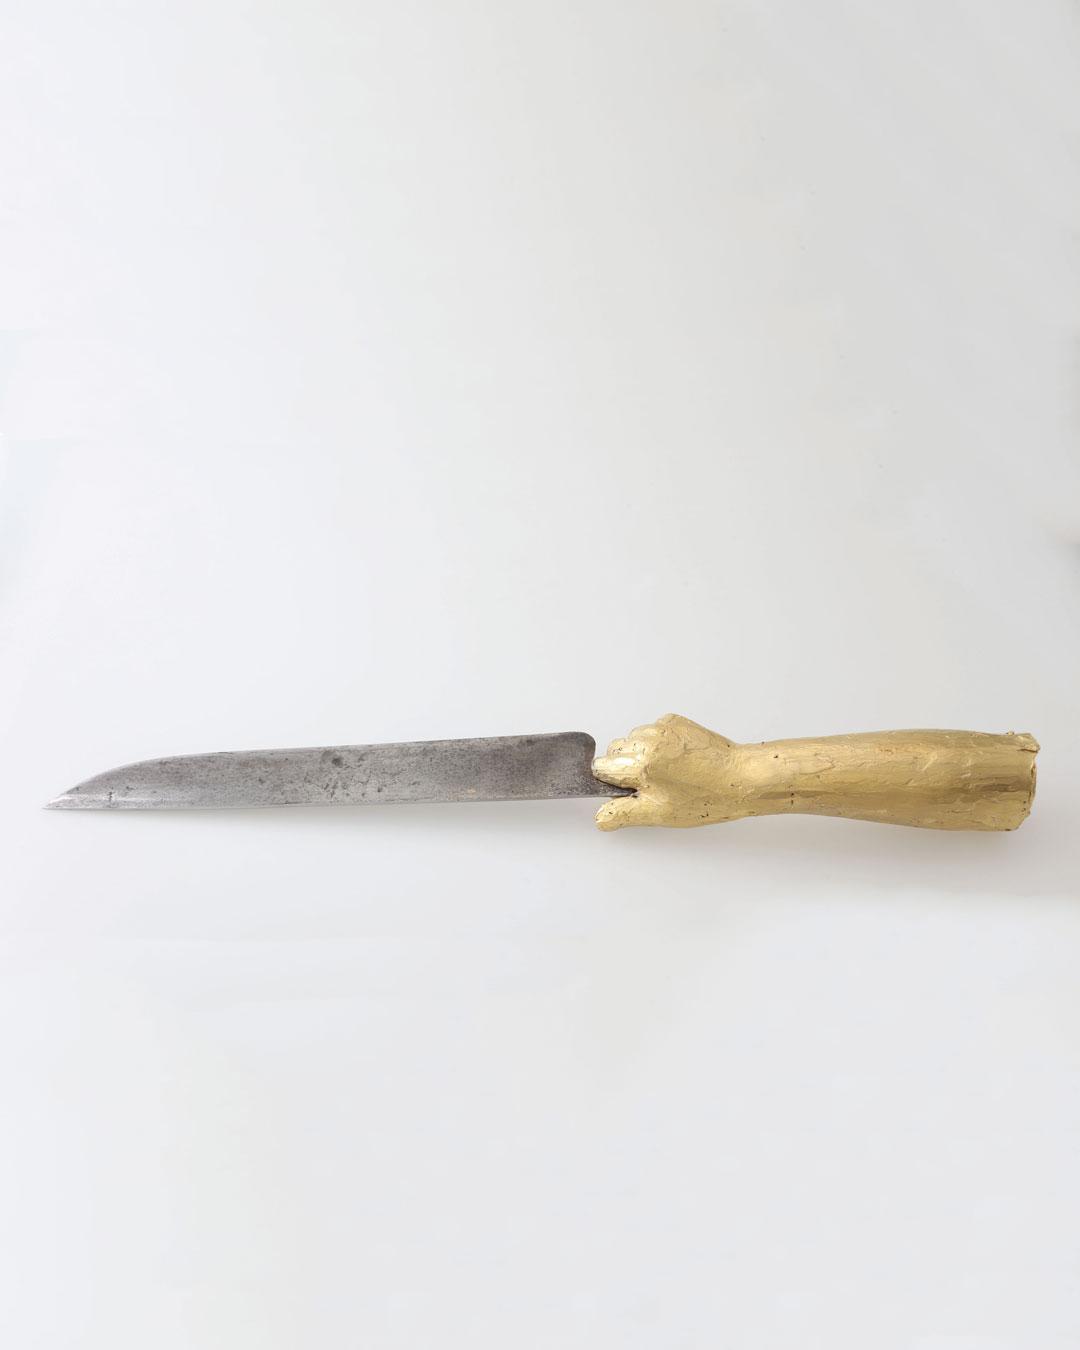 Juliane Brandes, zonder titel, 2017, mes; verguld messing, stalen (1860) lemmet, 320 x 30 mm, €2430